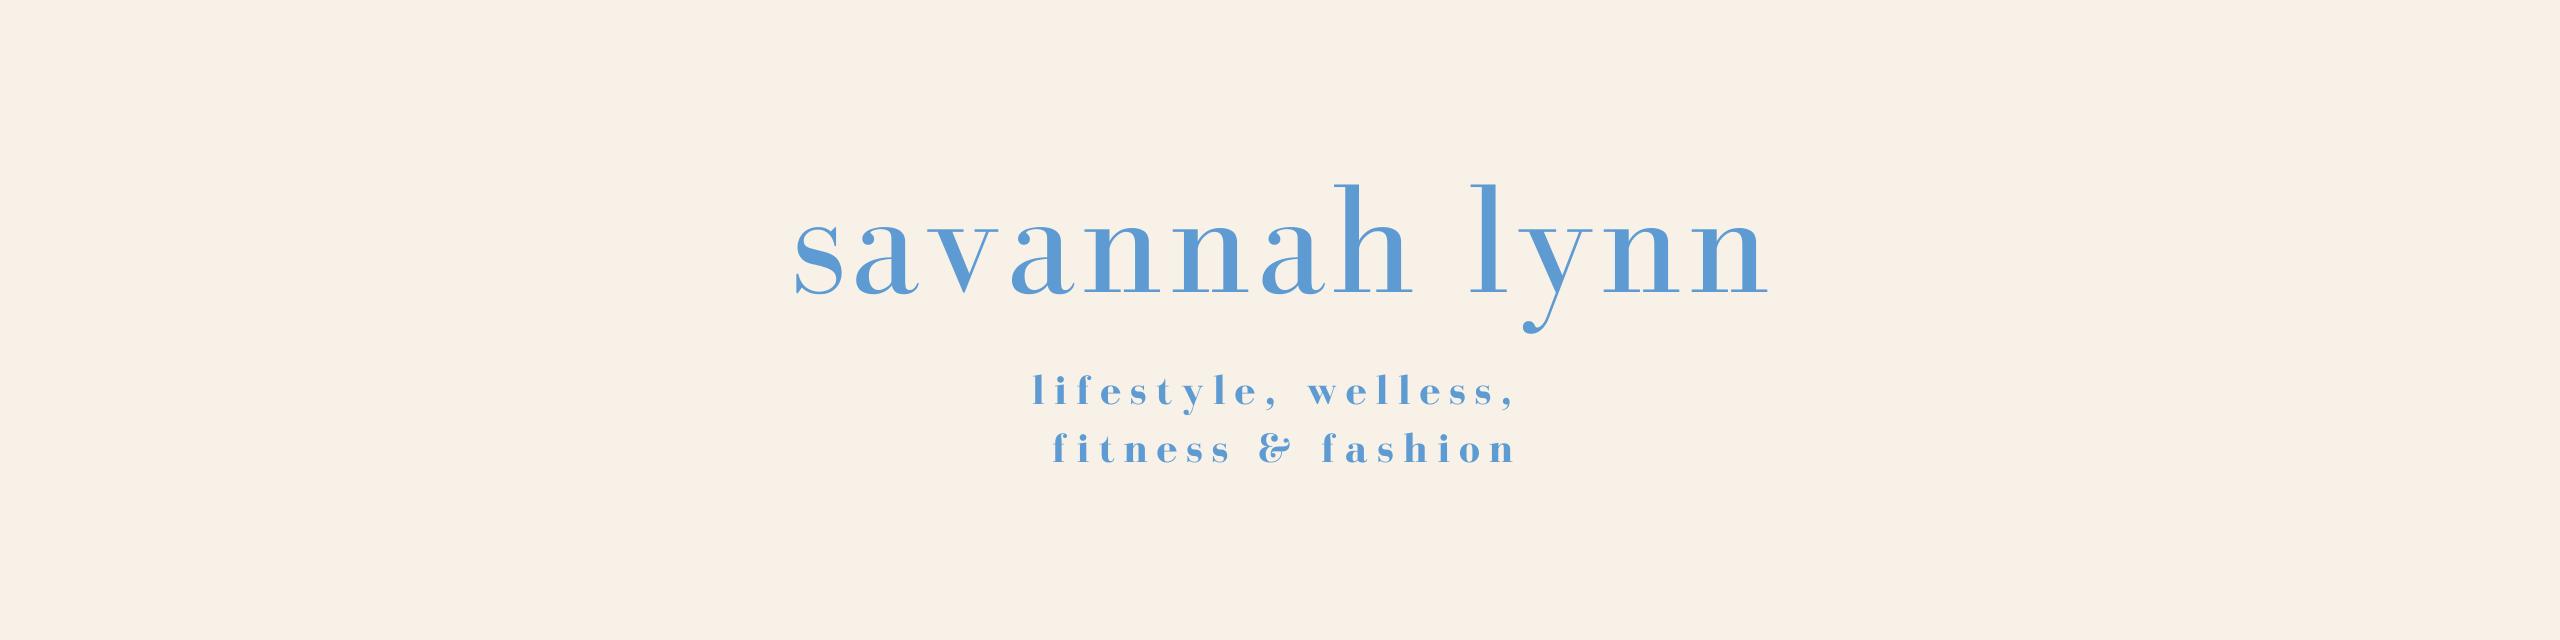 savannah lynn